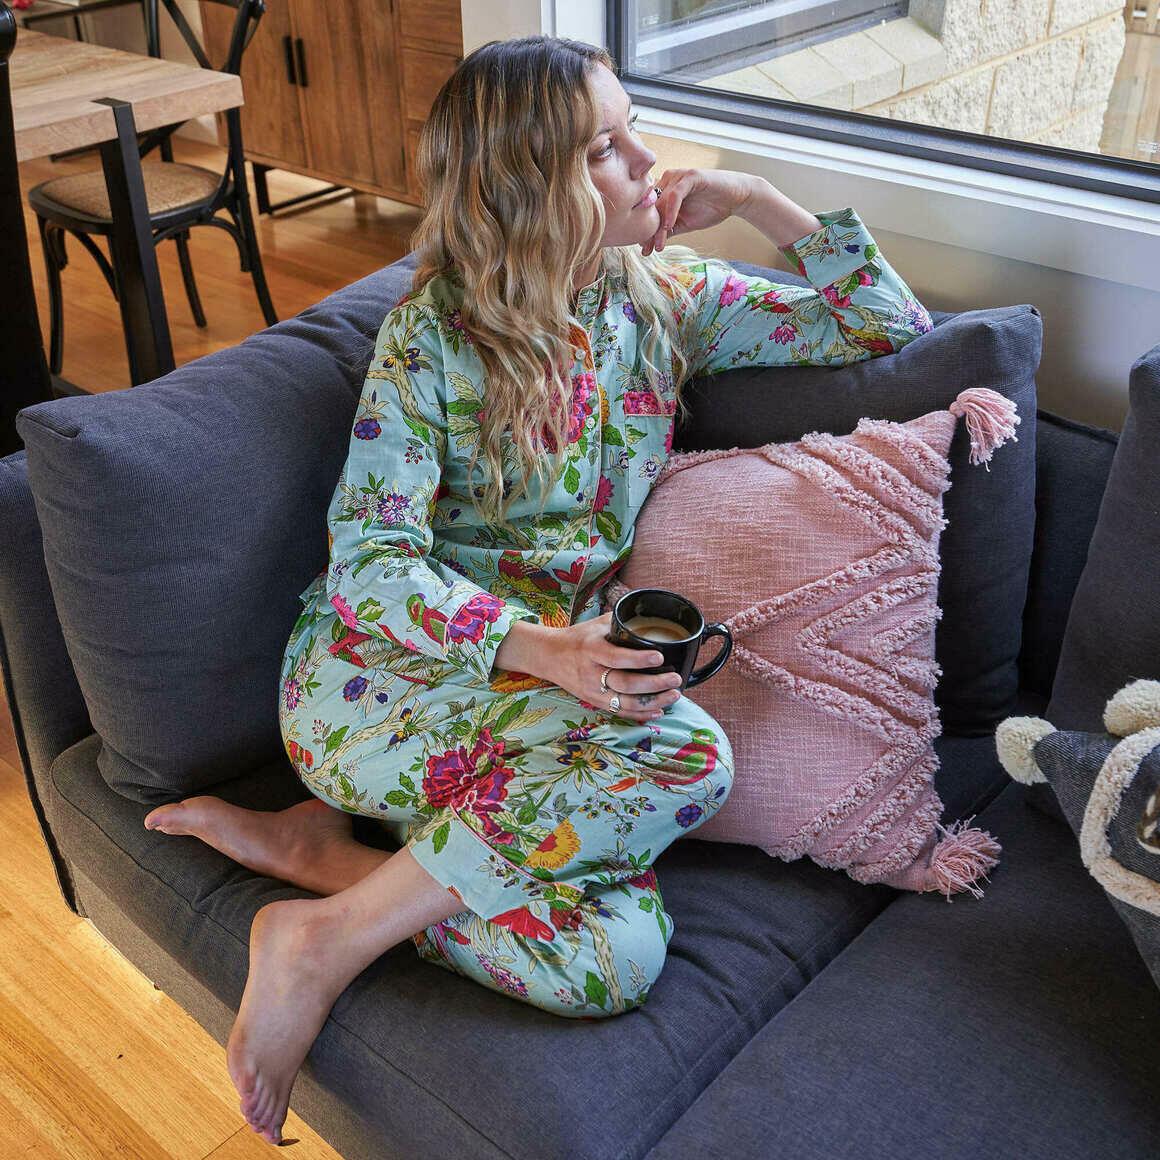 FLORAL PJ SET, Includes 4 sizes S,M,L,XL,  Personalized Pajamas, Bridal Party Pajamas, Bridesmaid PJs, Maid of Honor, Lounge wear, Sleepwear | Trada Marketplace